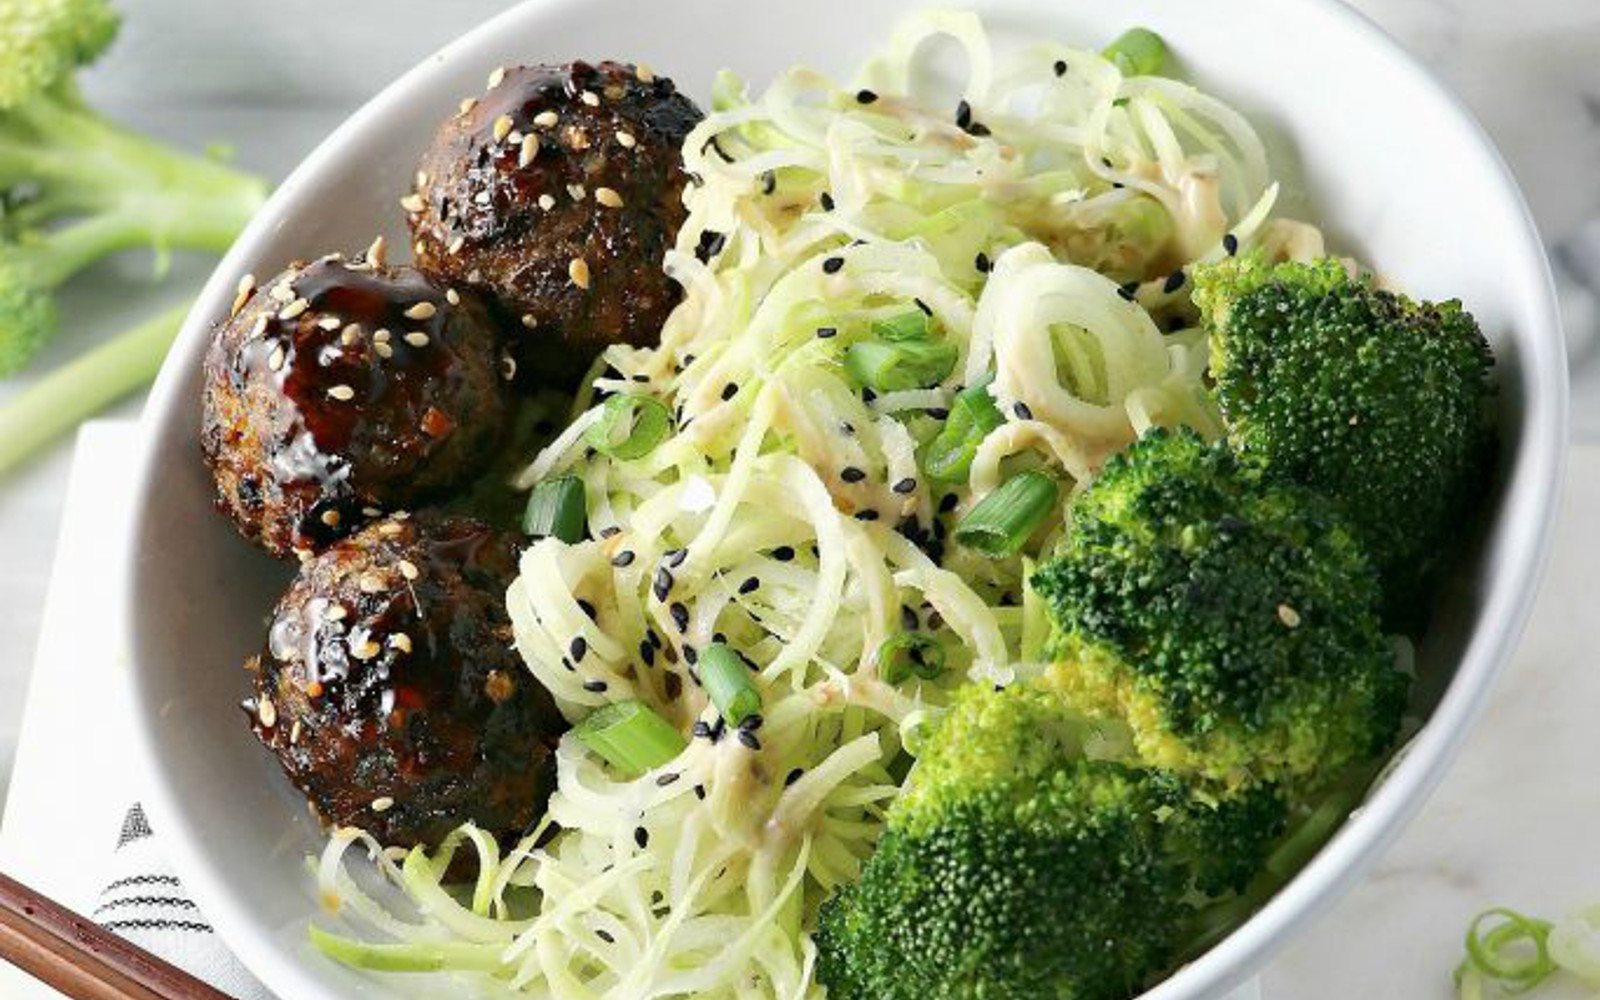 Broccoli Noodles With Asian Veggie Balls c